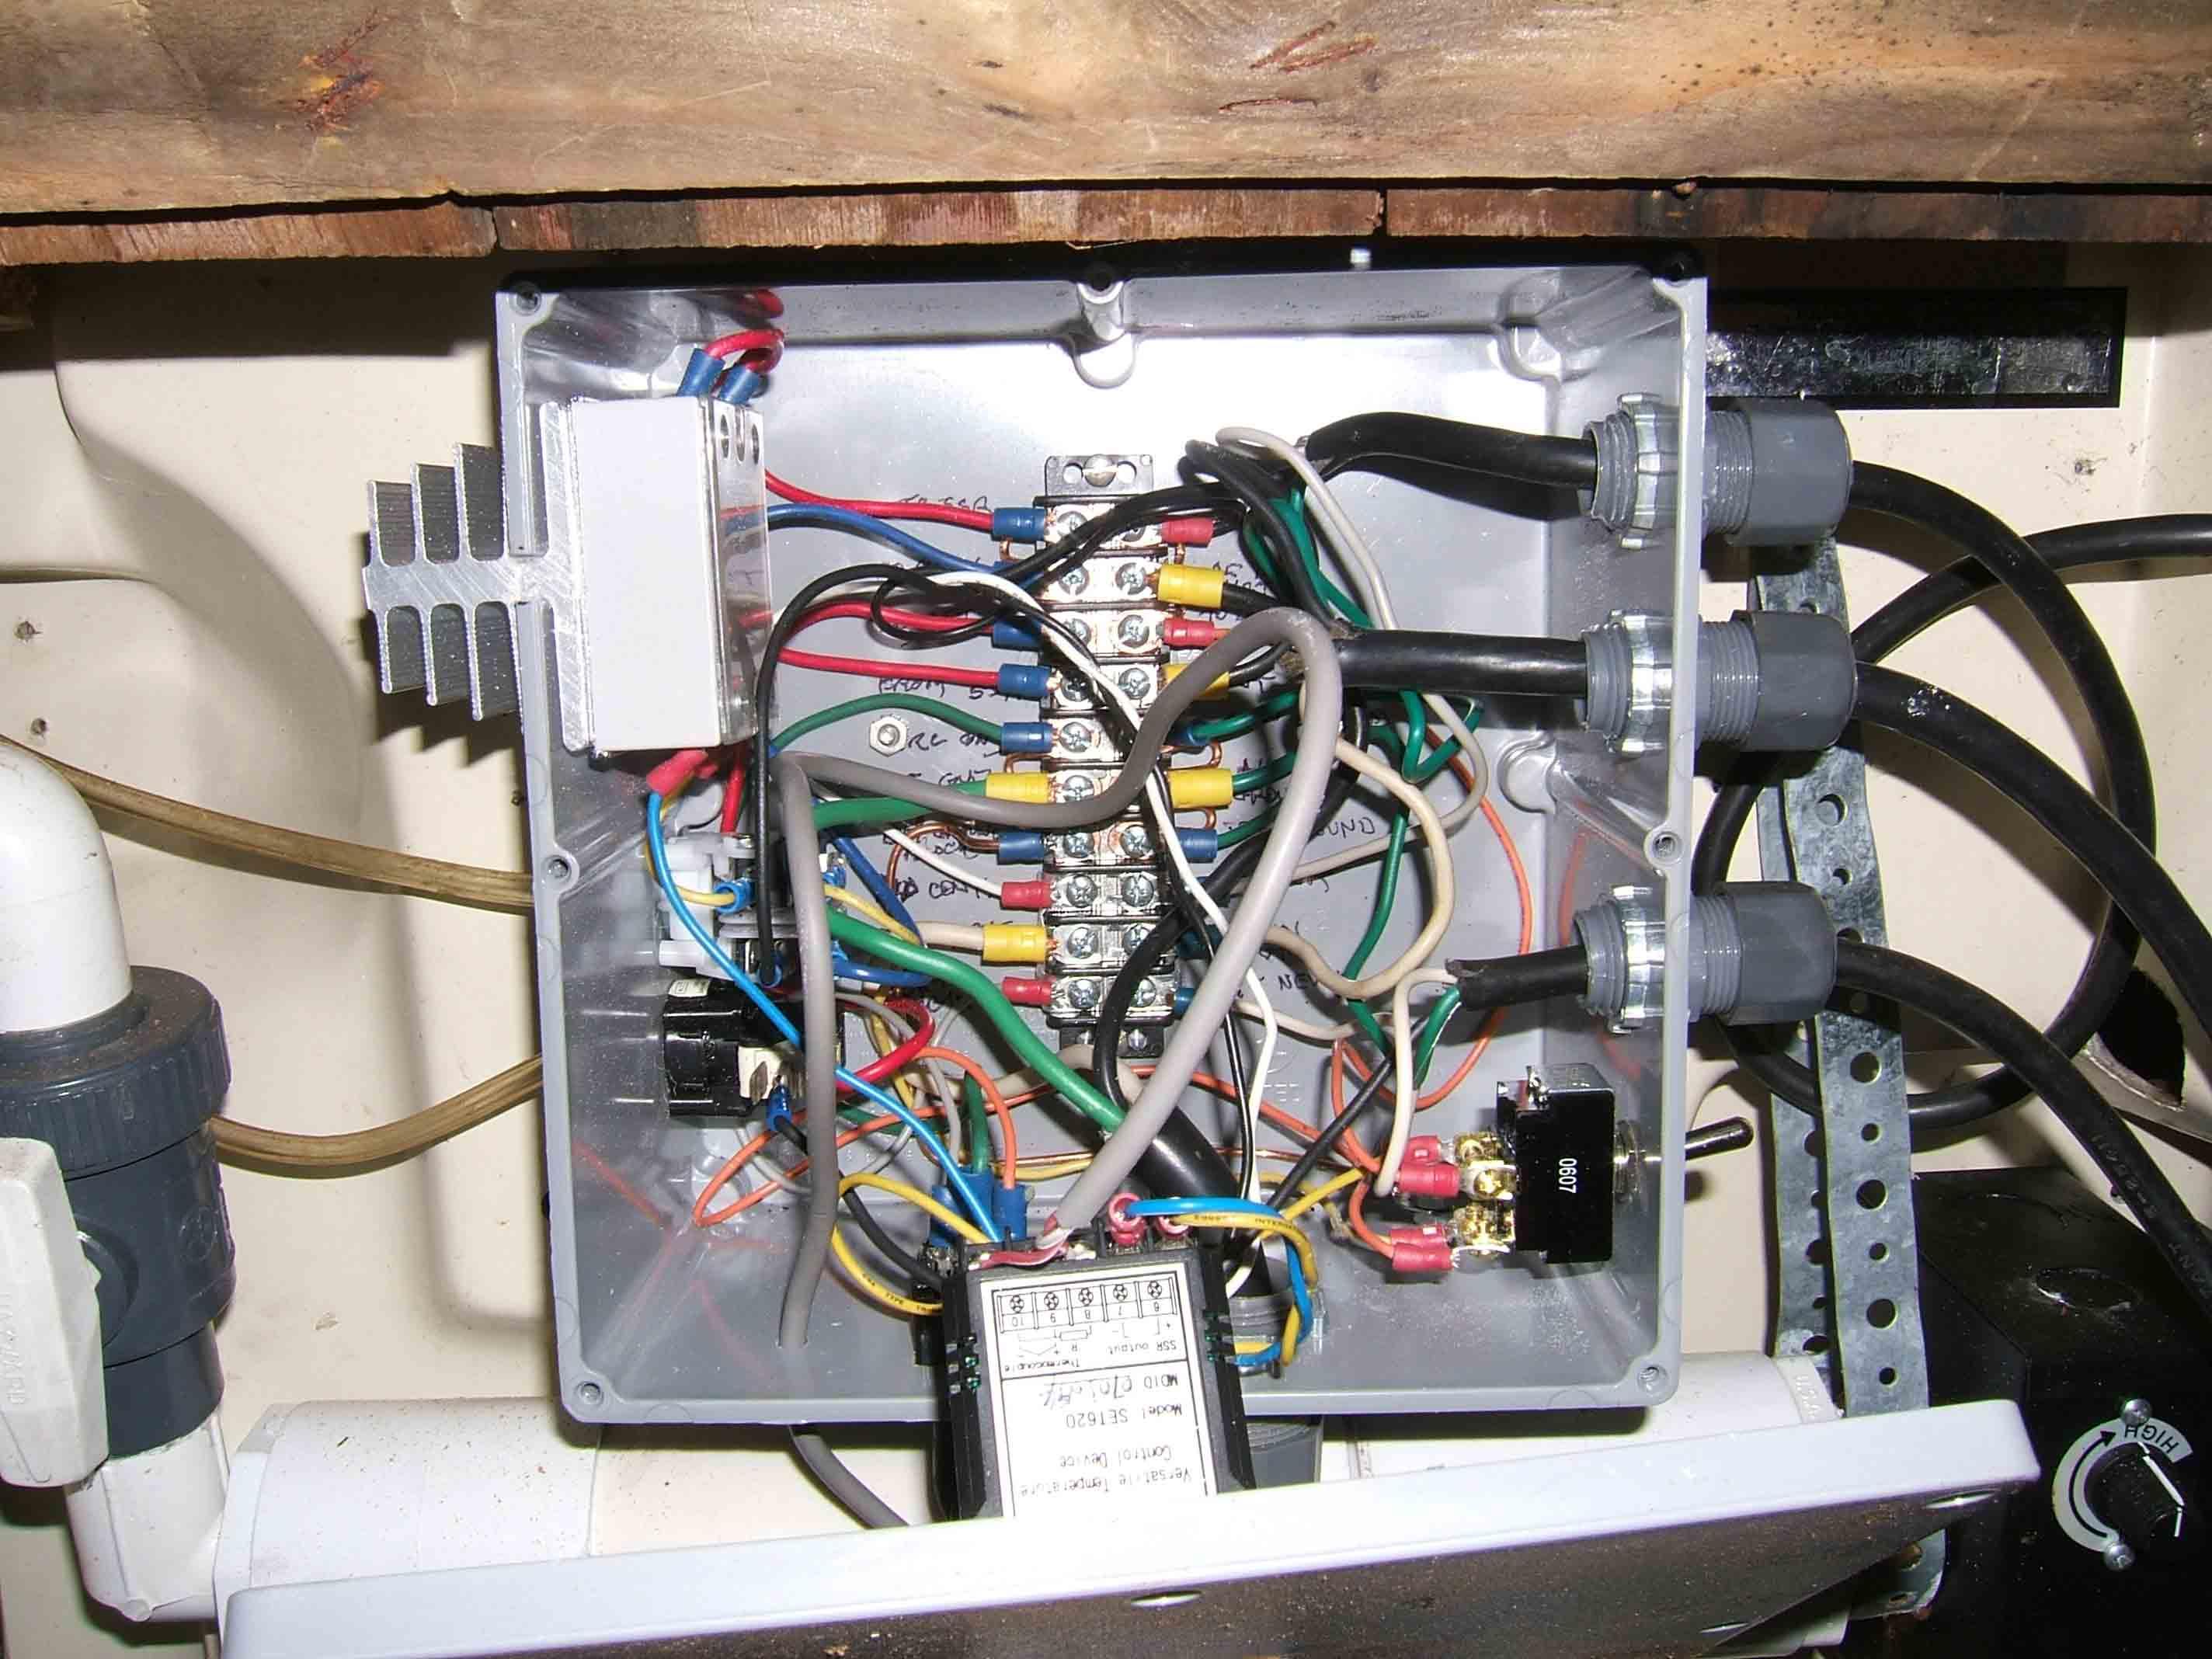 Hot Tub Heater Wiring Diagram Hot Tub Wiring Diagram